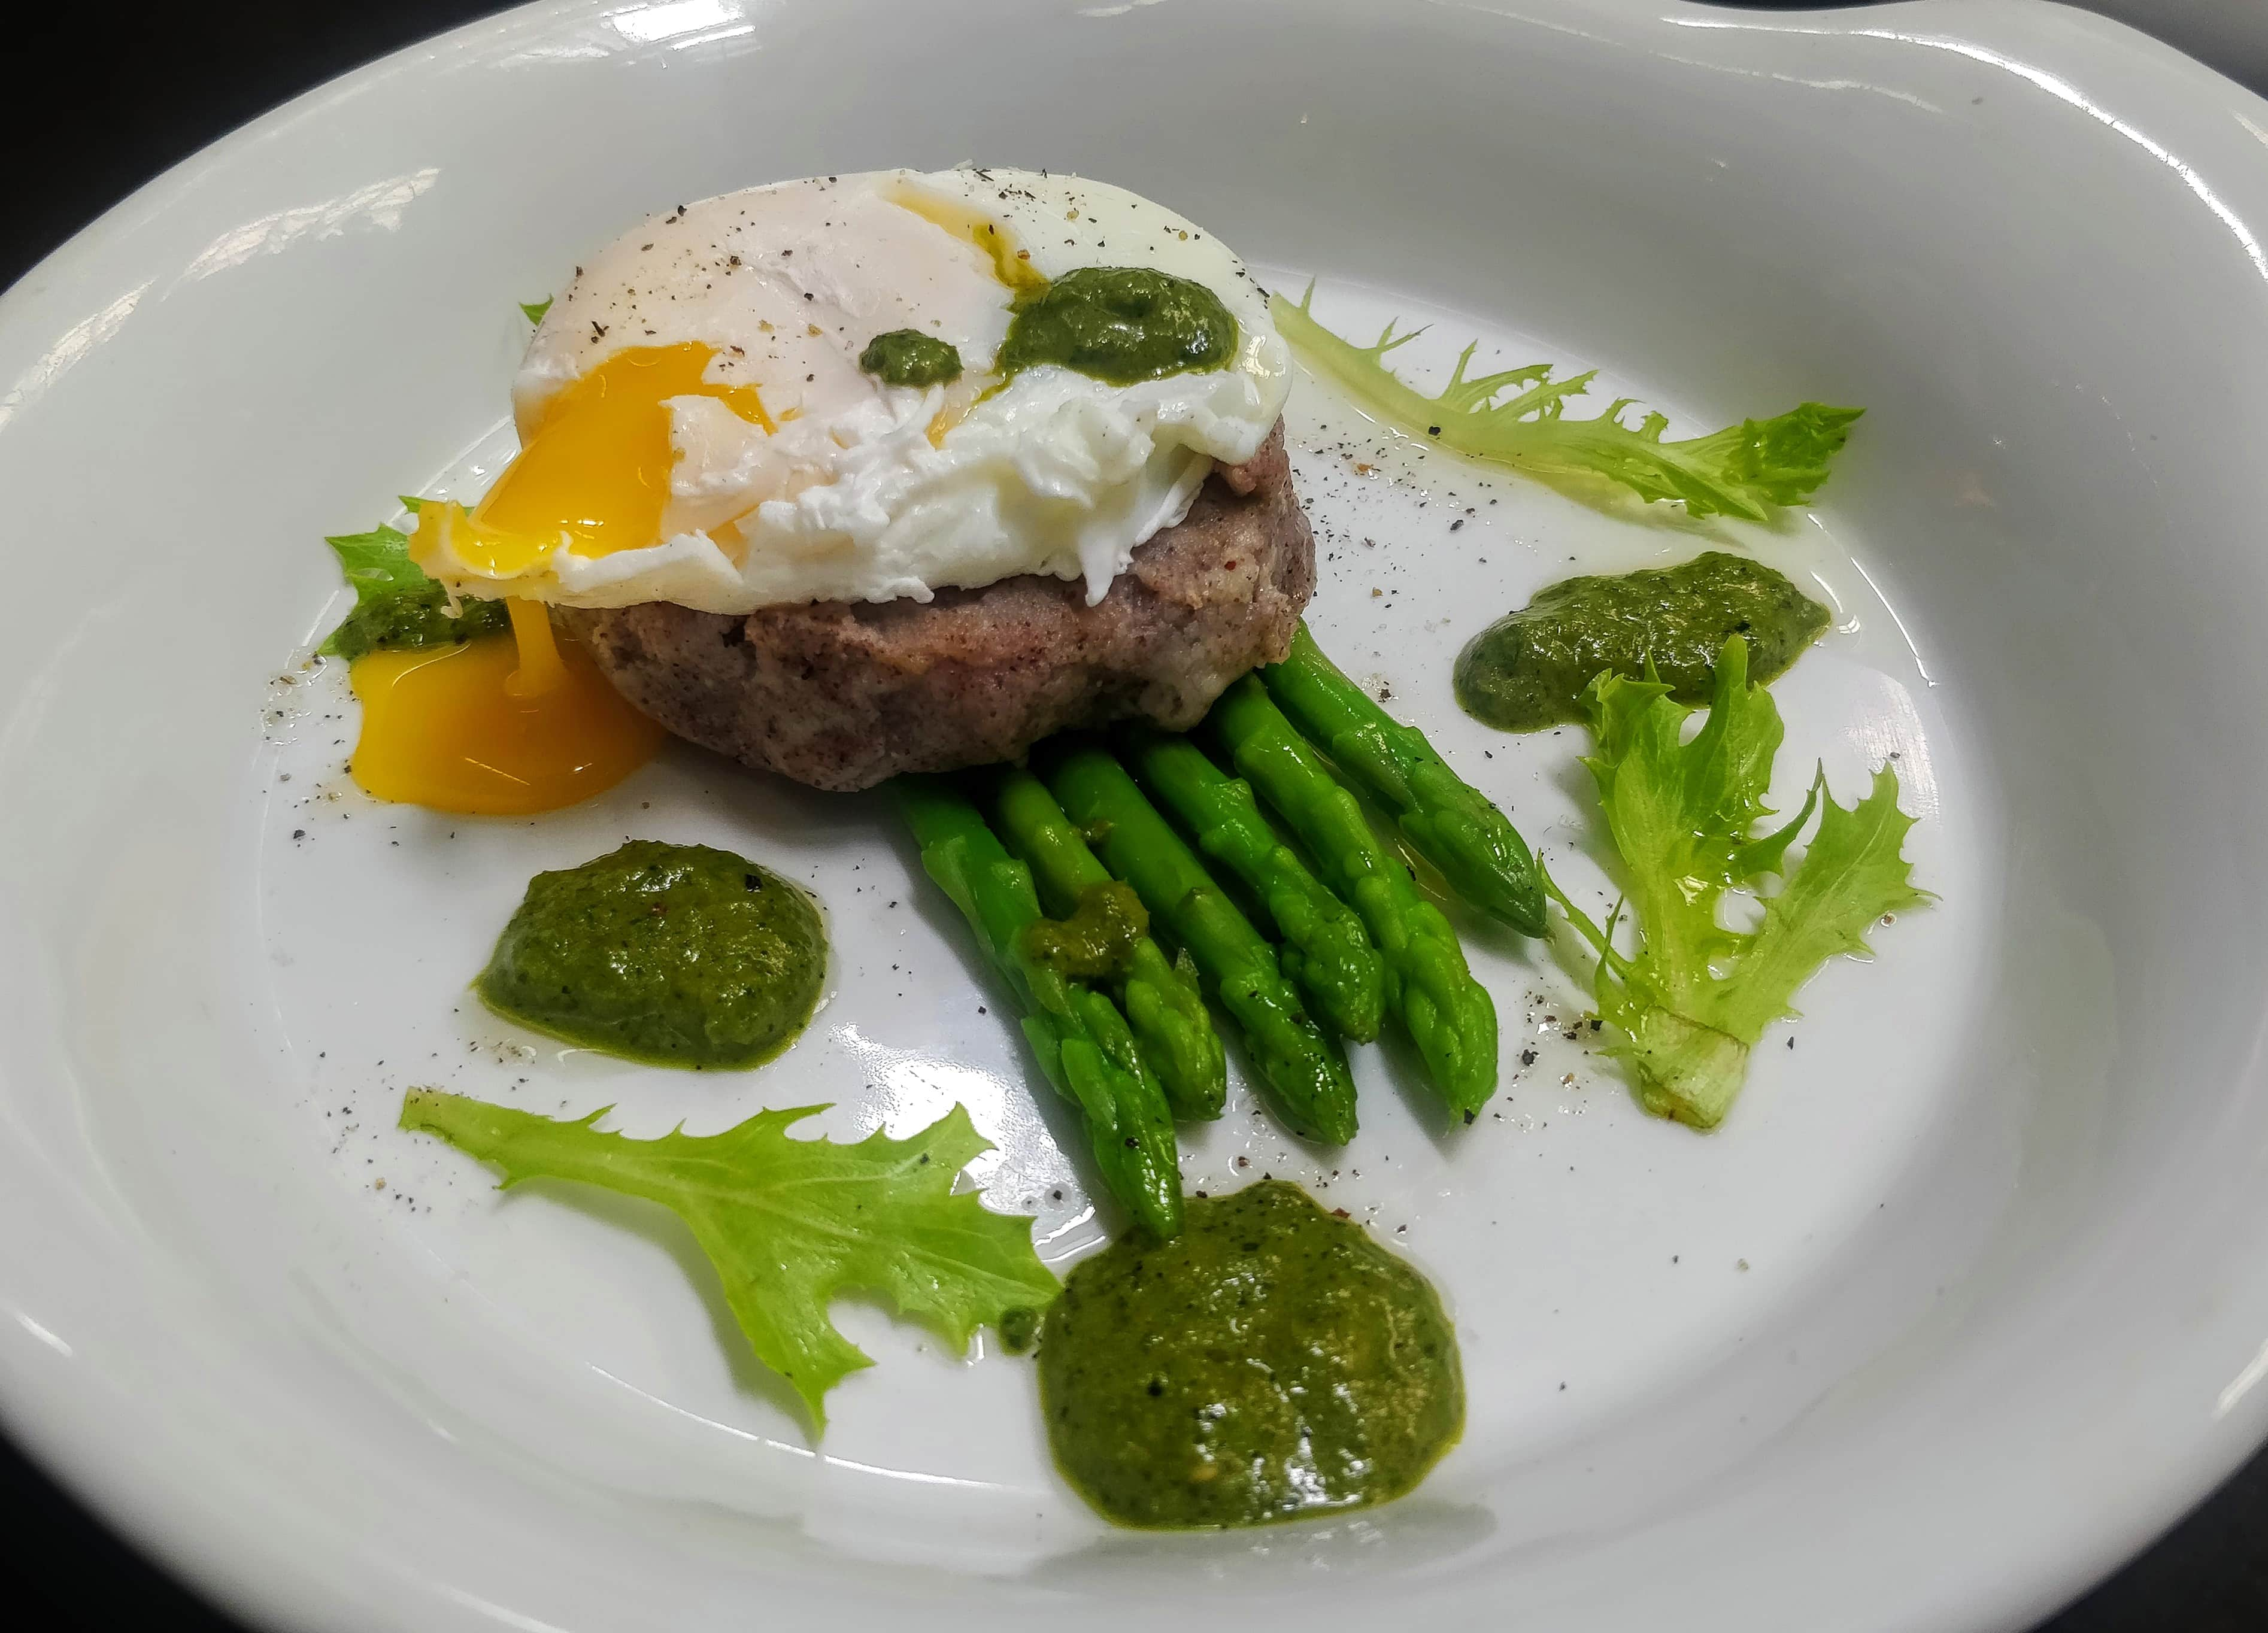 Ragi Mudde Poached Egg with Pesto